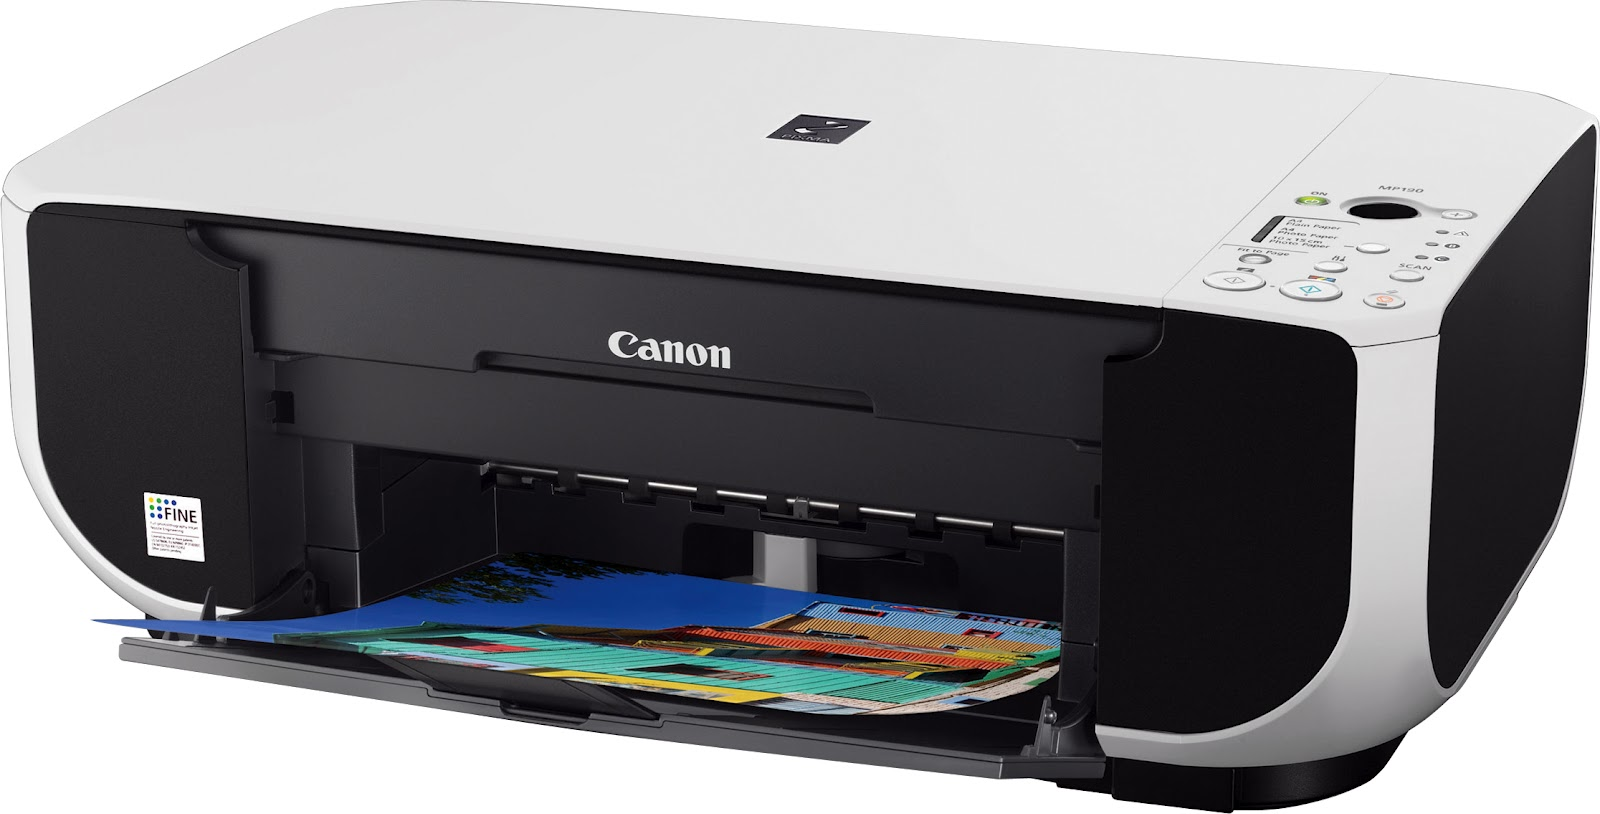 Драйвер На Принтер Canon S200x